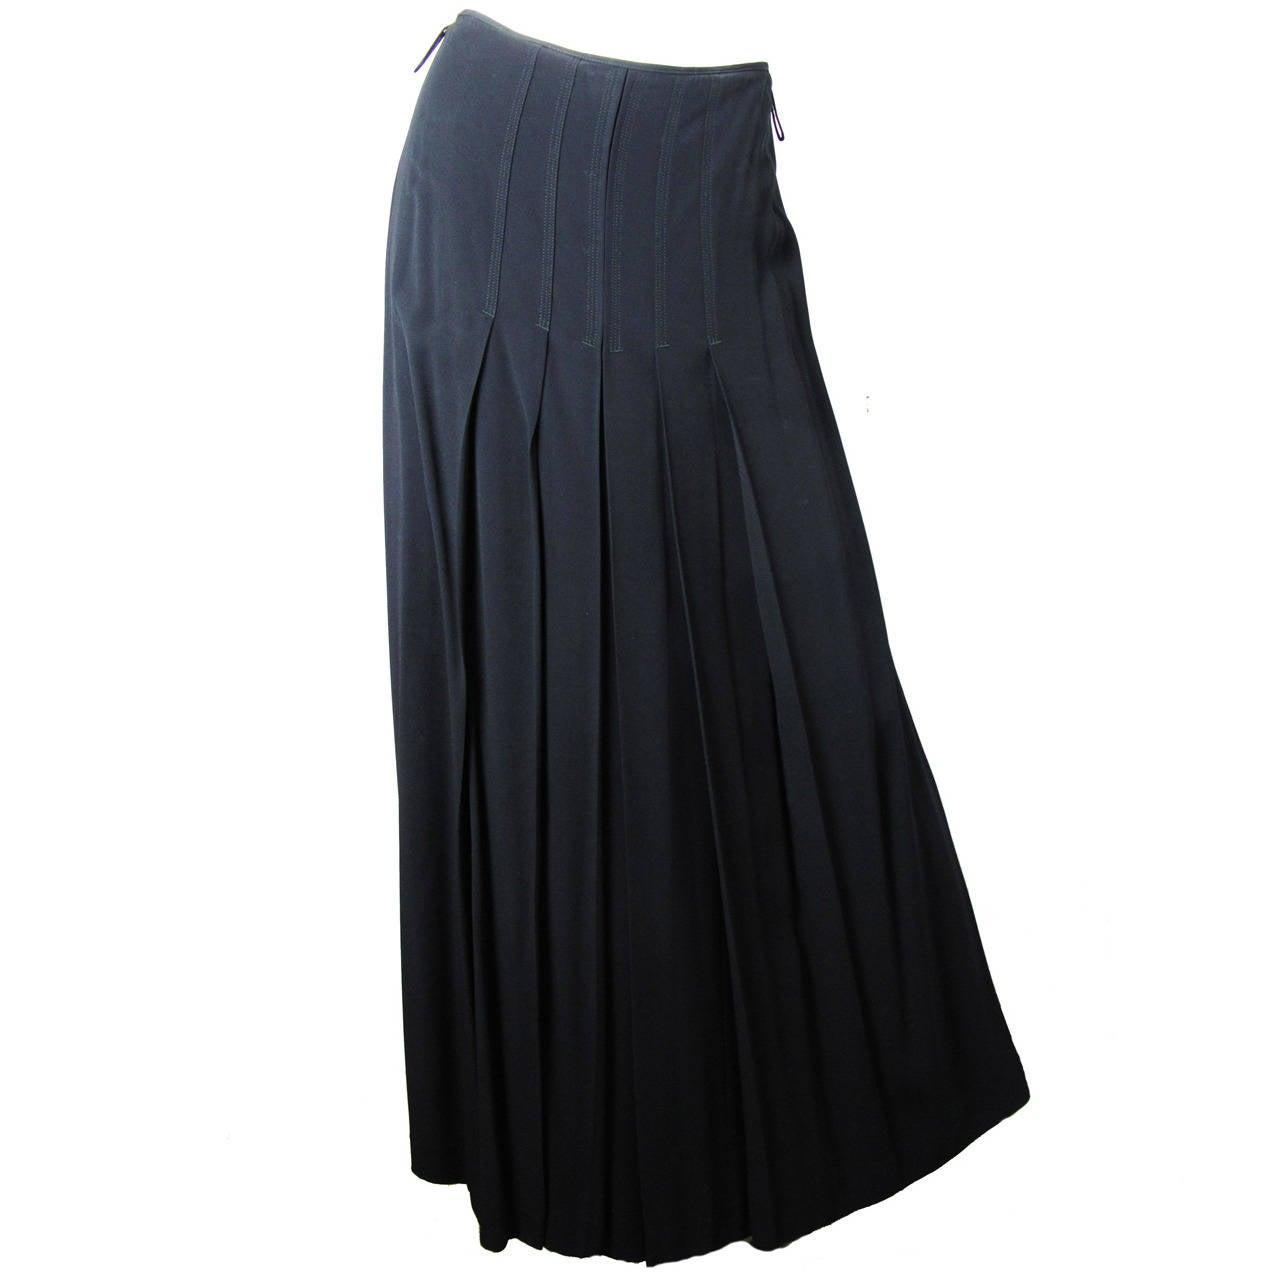 Jean Paul Gaultier Black Pleated Ankle Length Evening Skirt